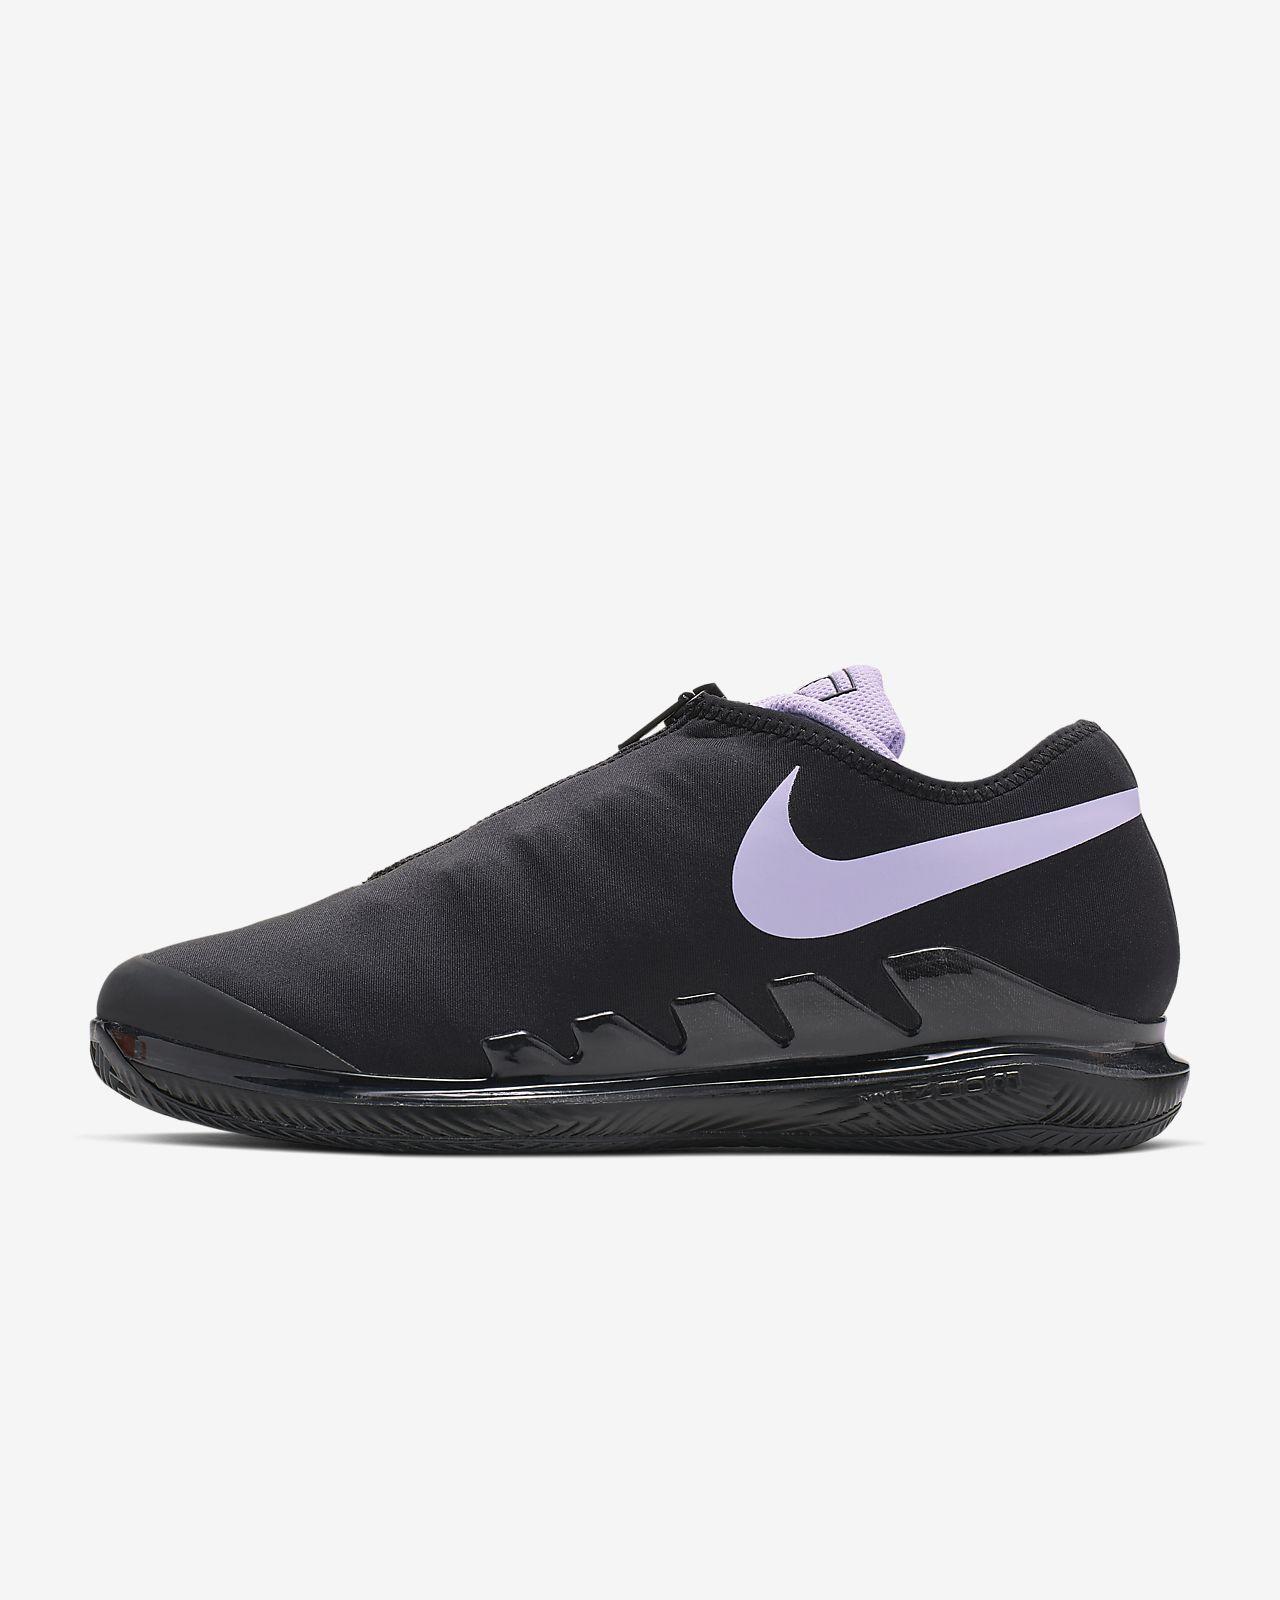 NikeCourt Air Zoom Vapor X Glove Women